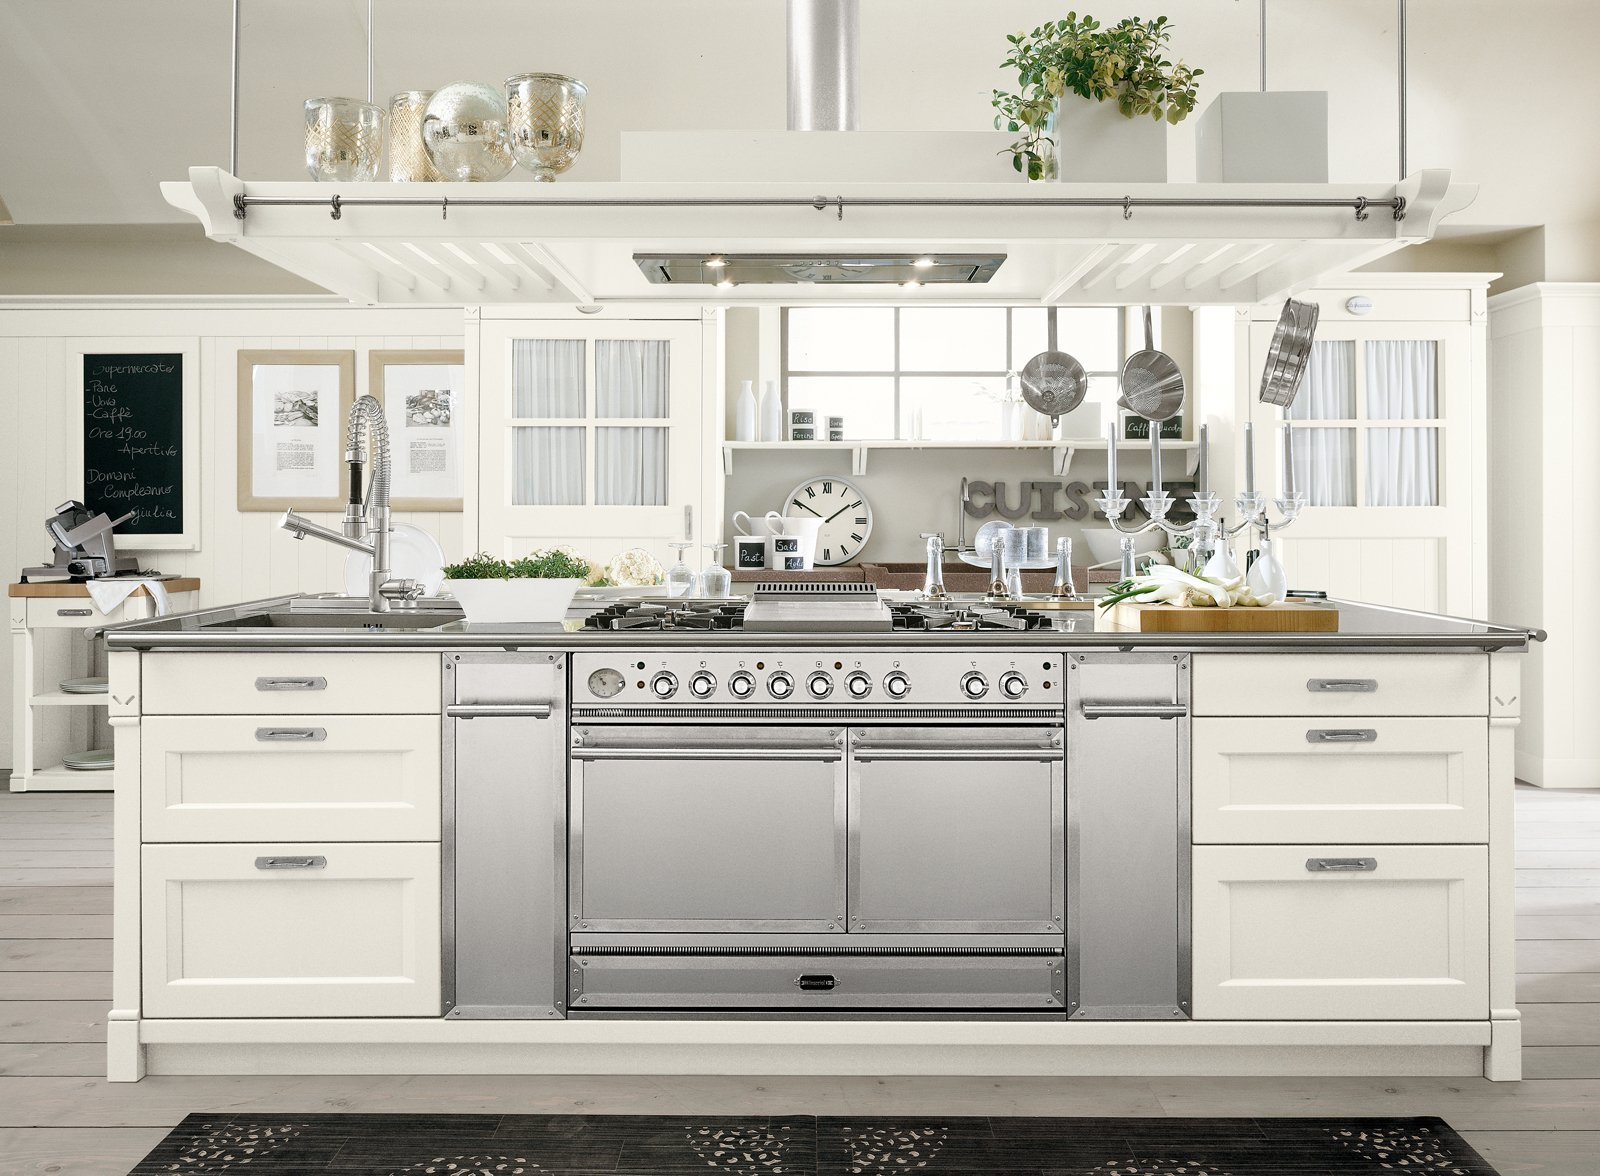 Angolo Cottura Dwg : Cucine industriali dwg. fabulous piante cucina dwg arredamento